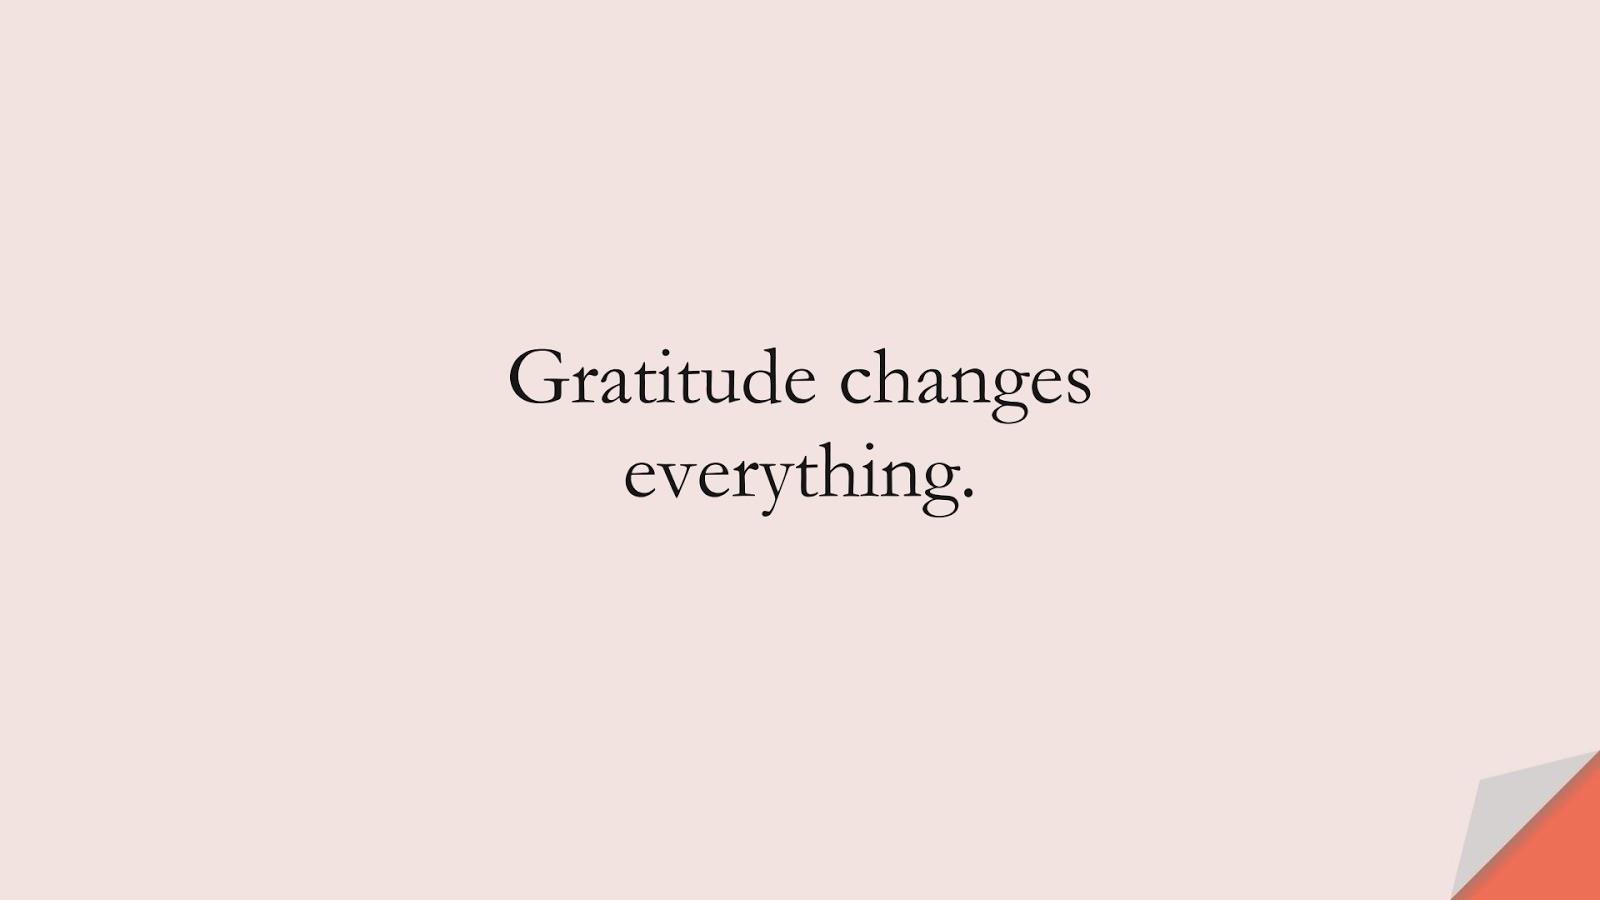 Gratitude changes everything.FALSE